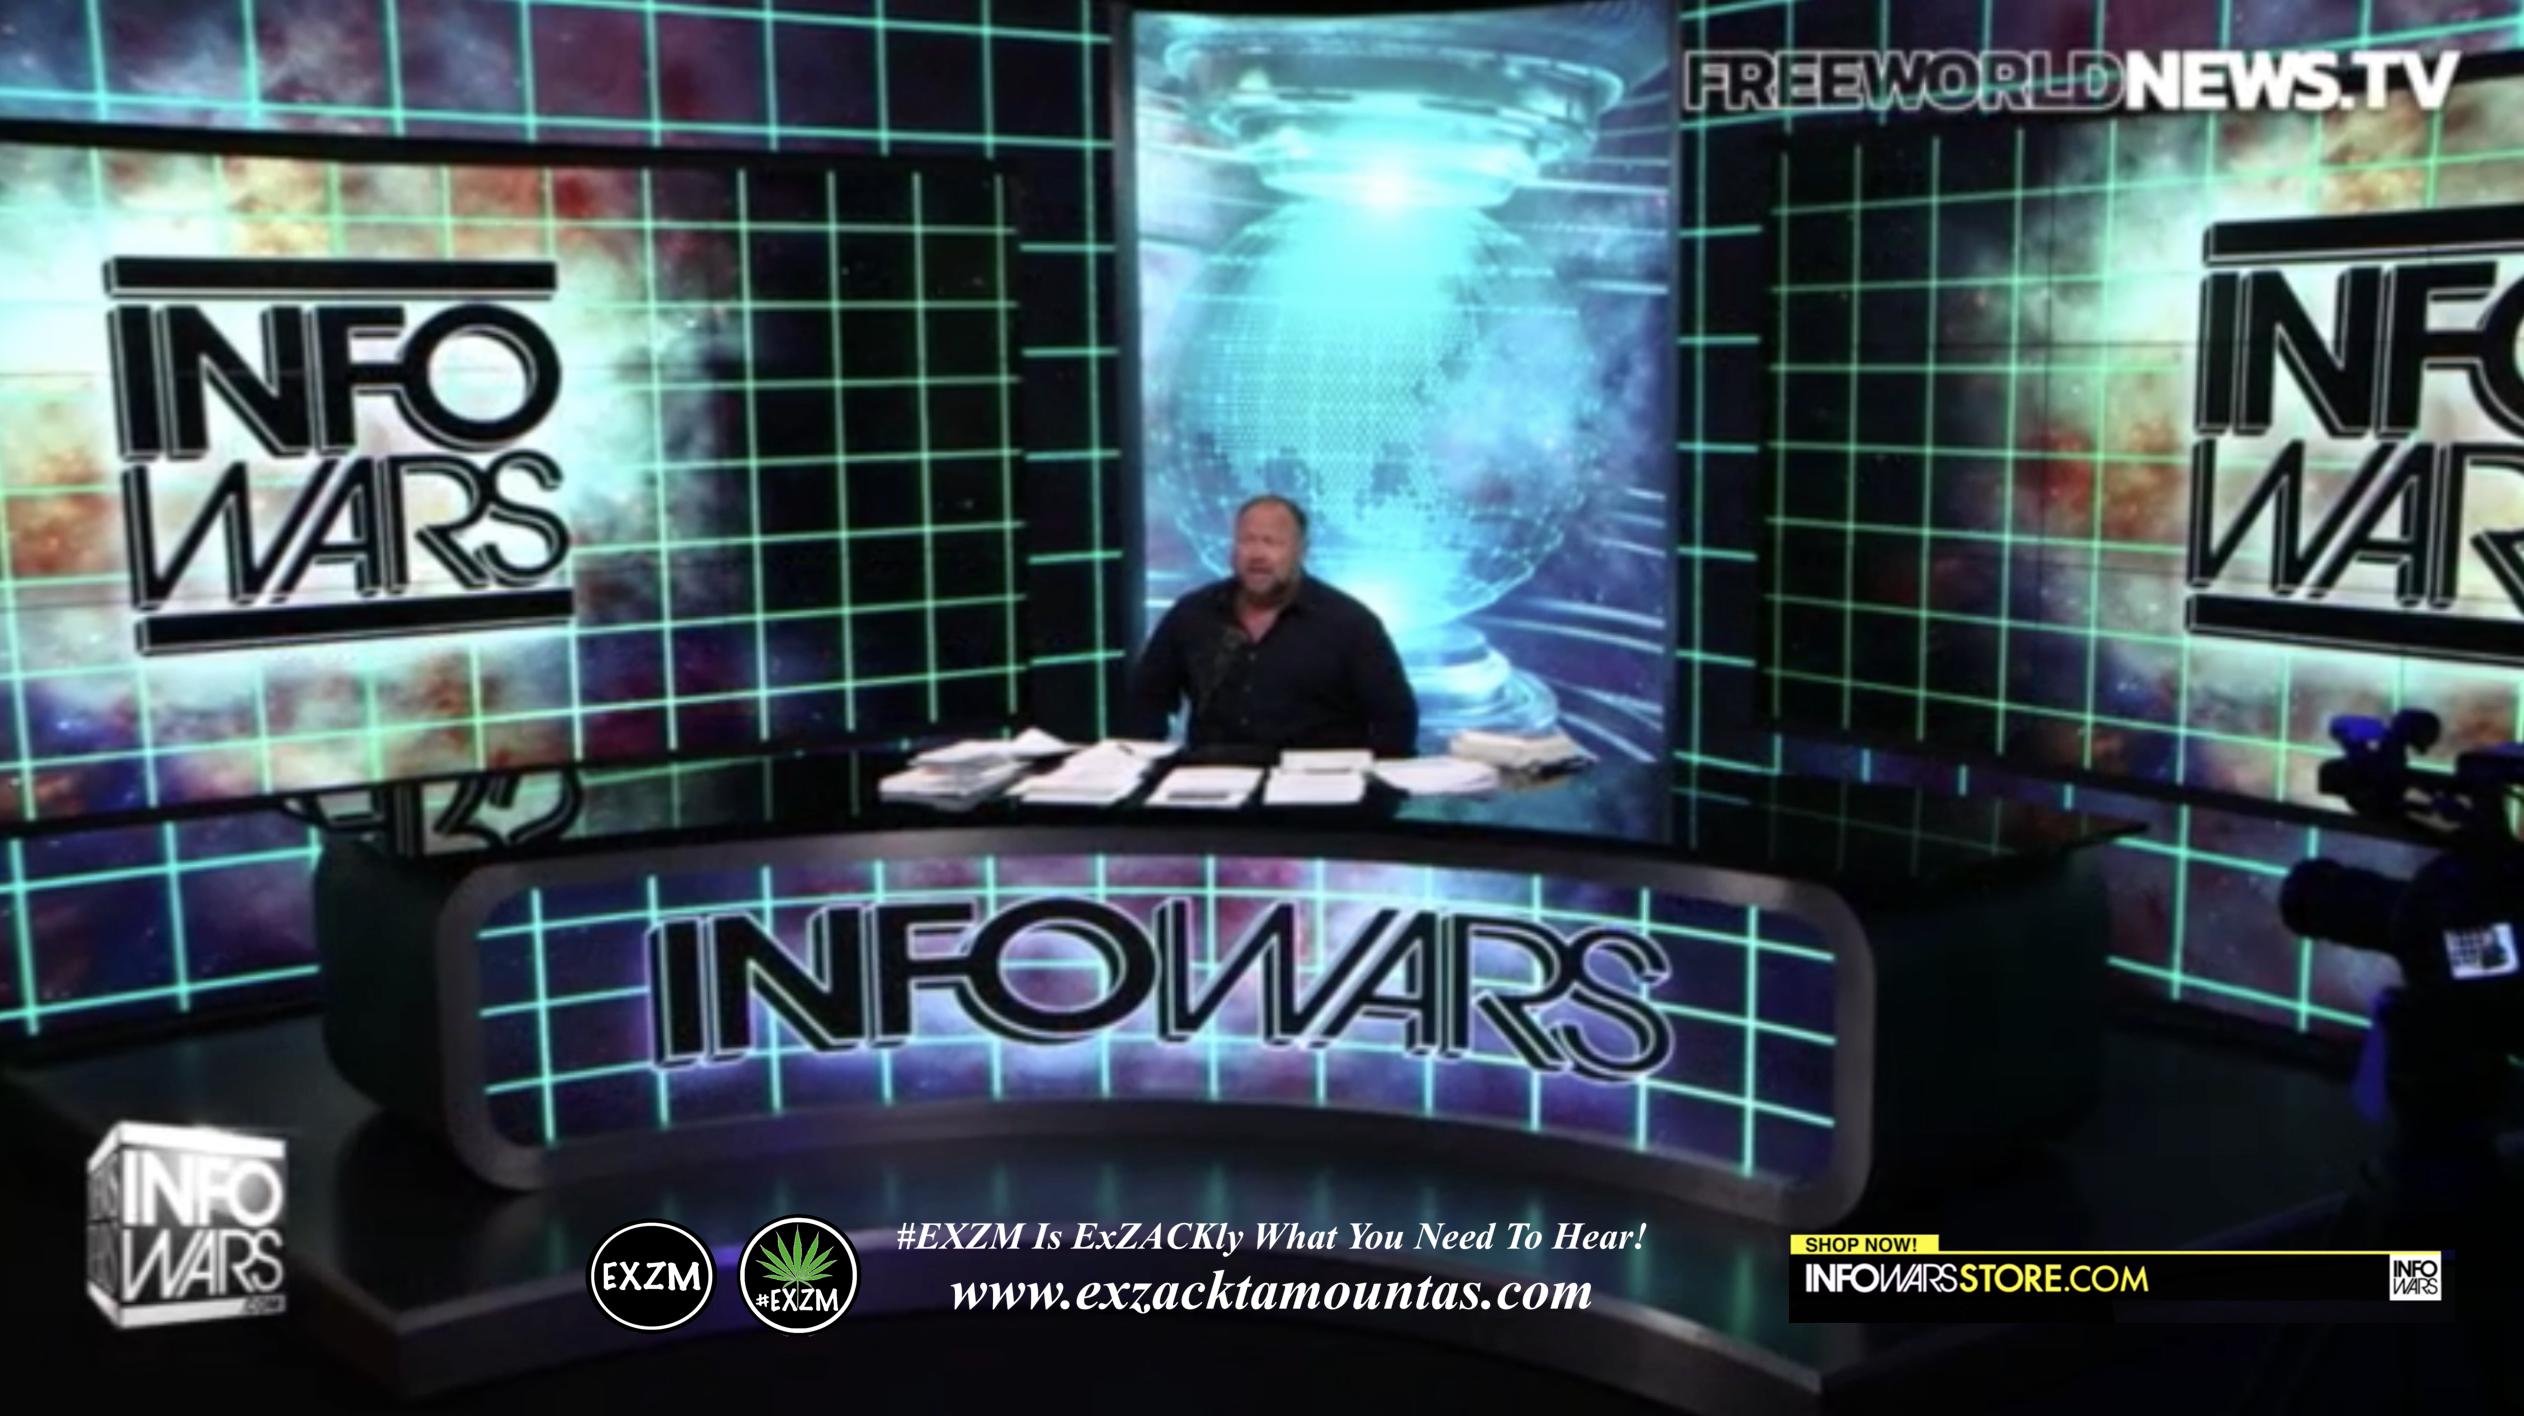 Alex Jones Live In Infowars Studio Free World News TV EXZM Zack Mount August 1st 2021 copy